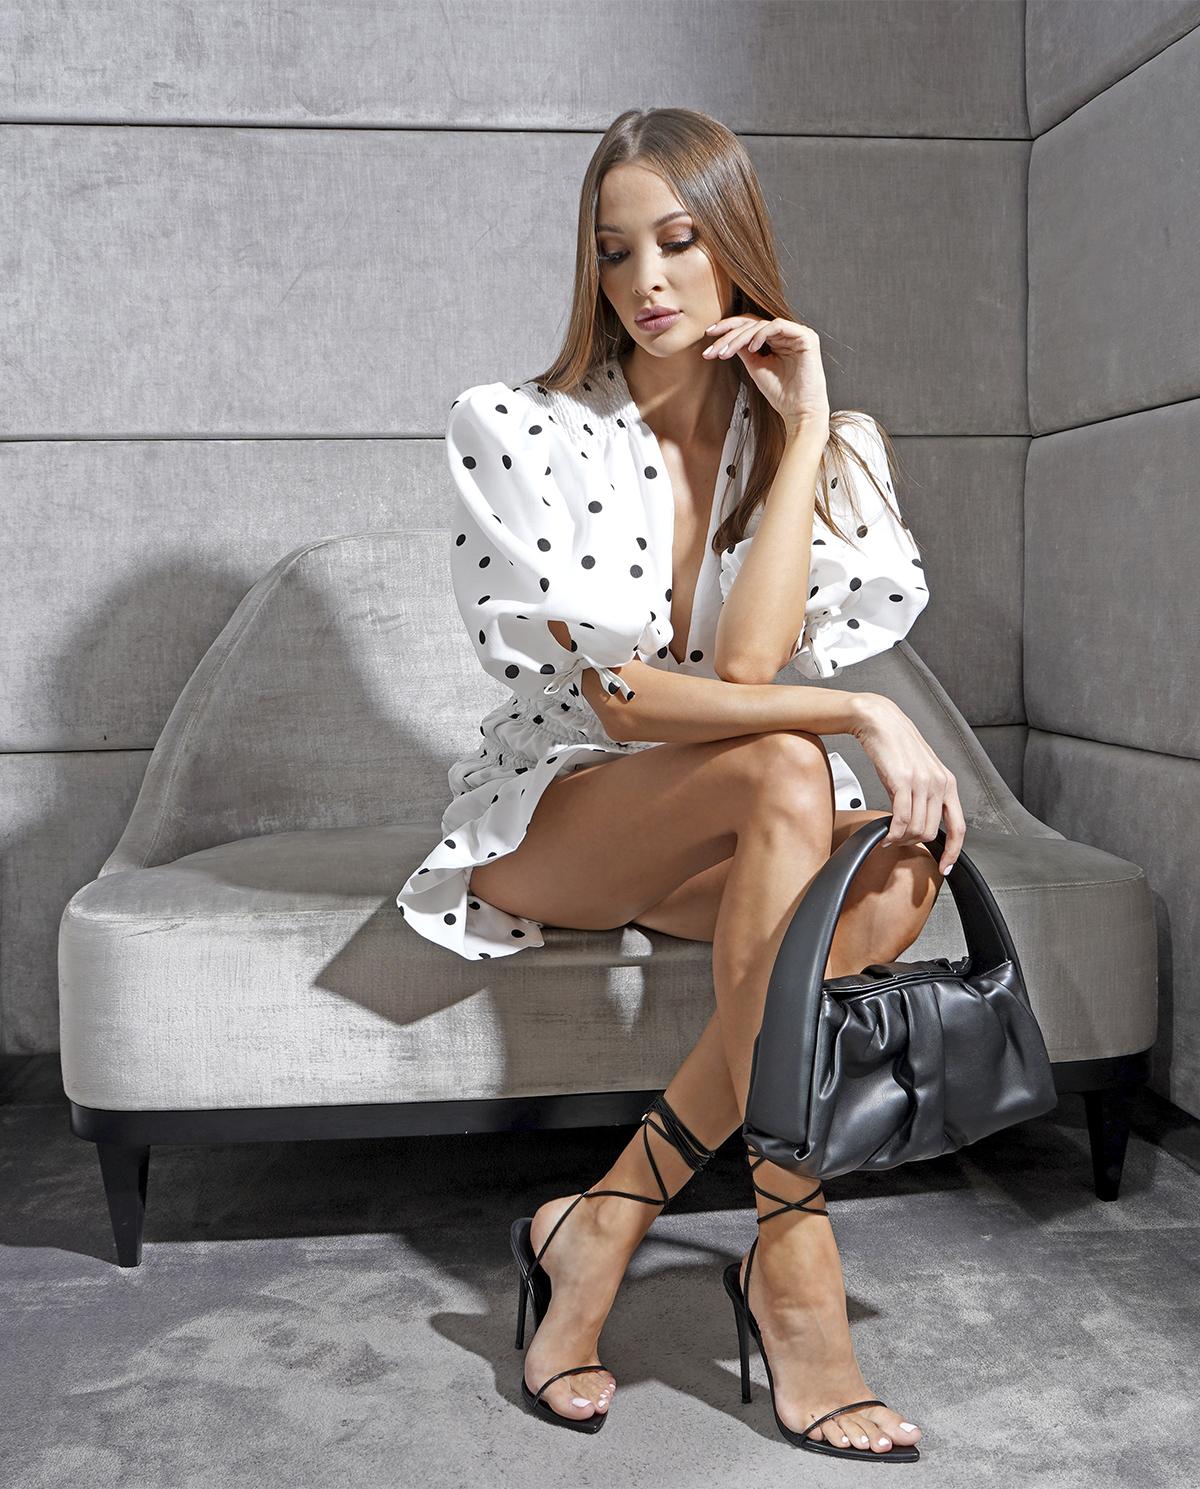 Biała sukienka Eye Candy Marianna Senchina